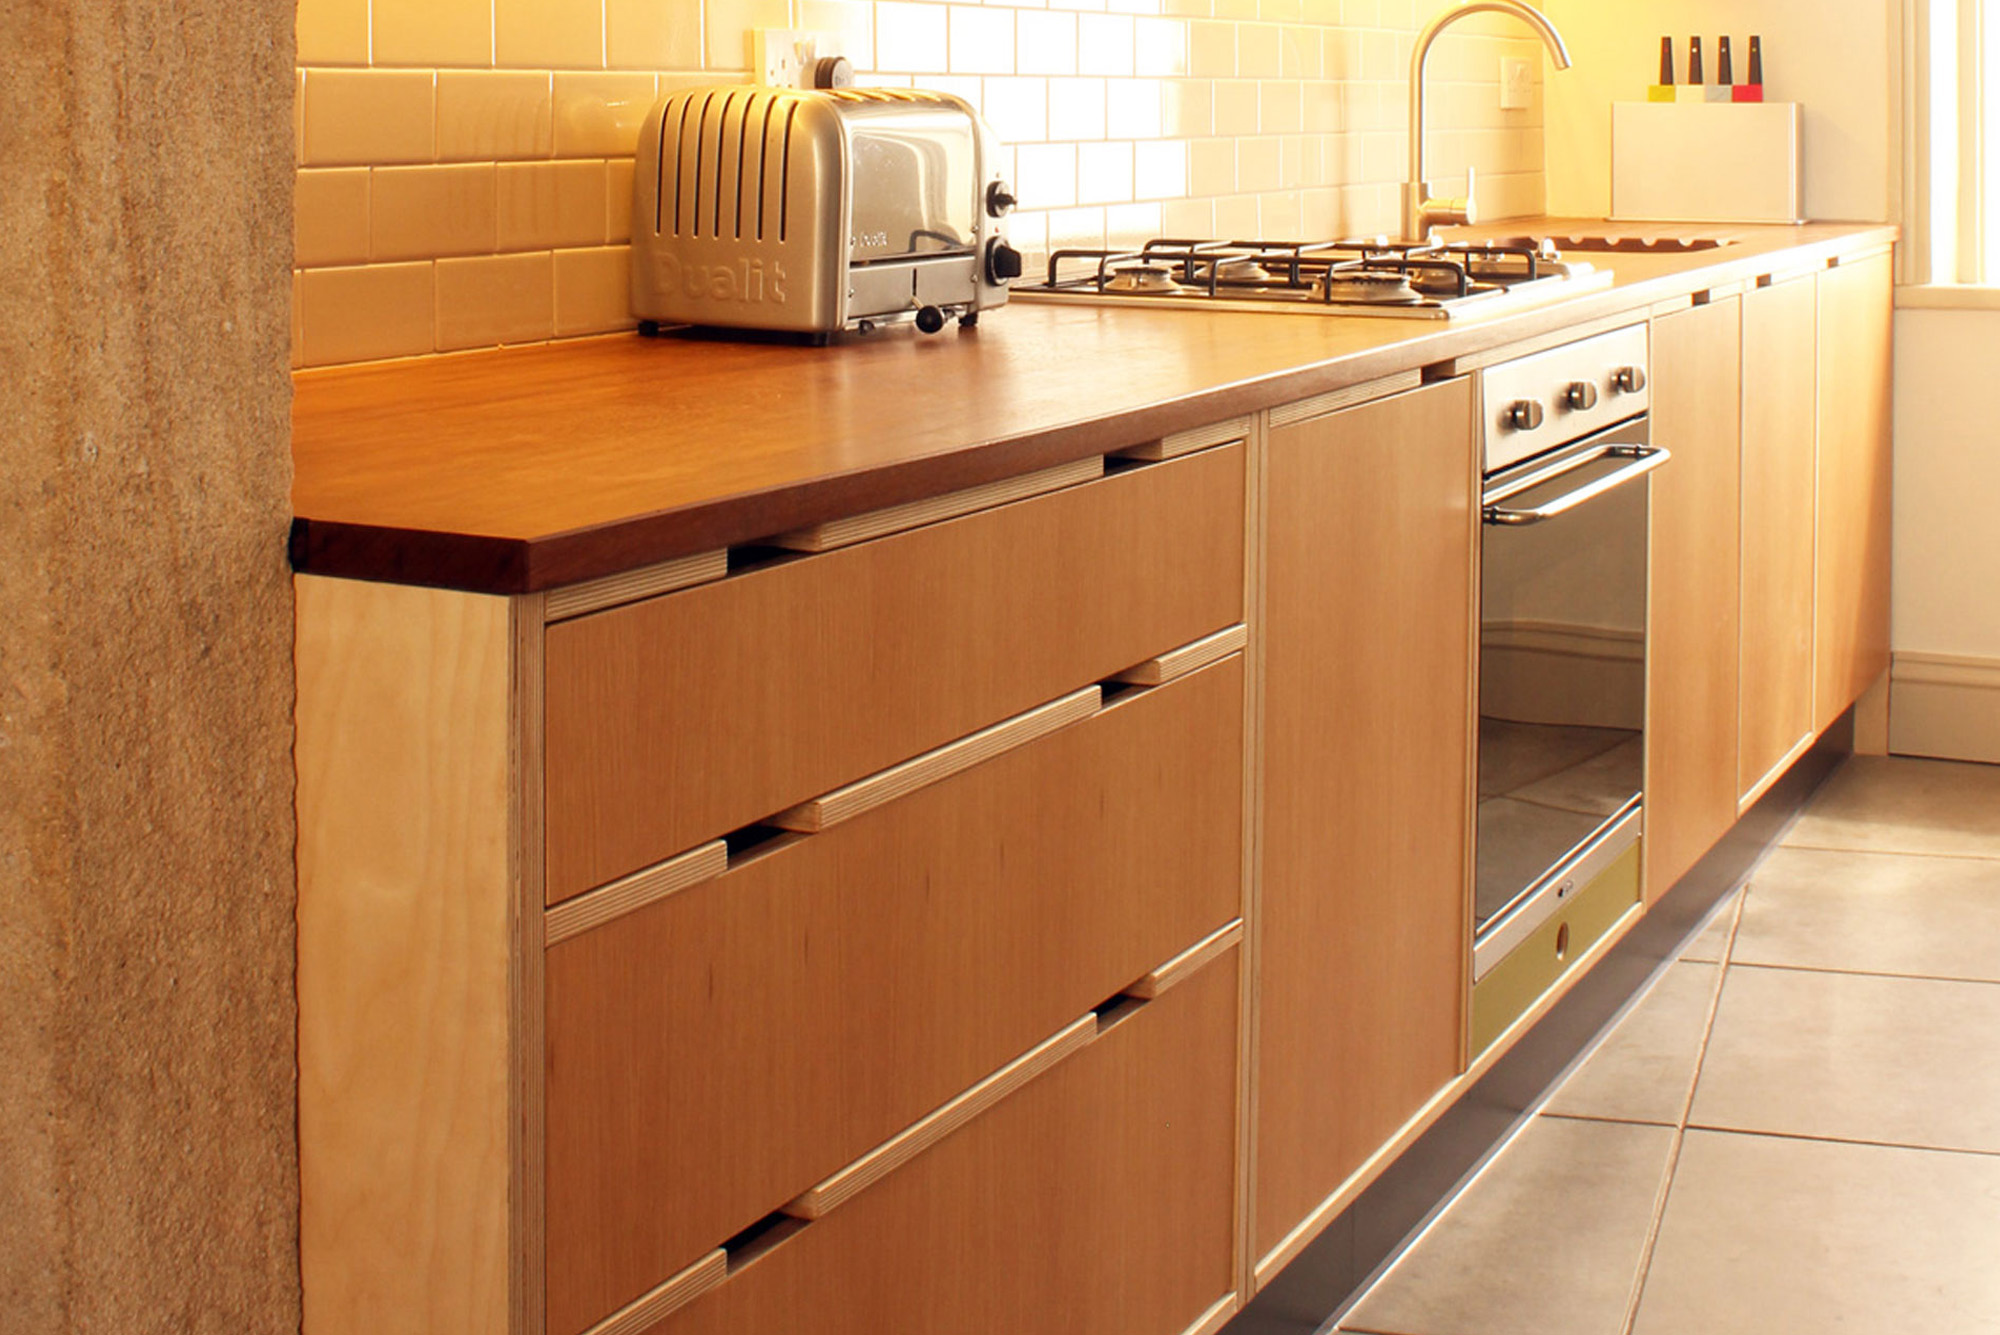 Oak veneered kitchen drawers